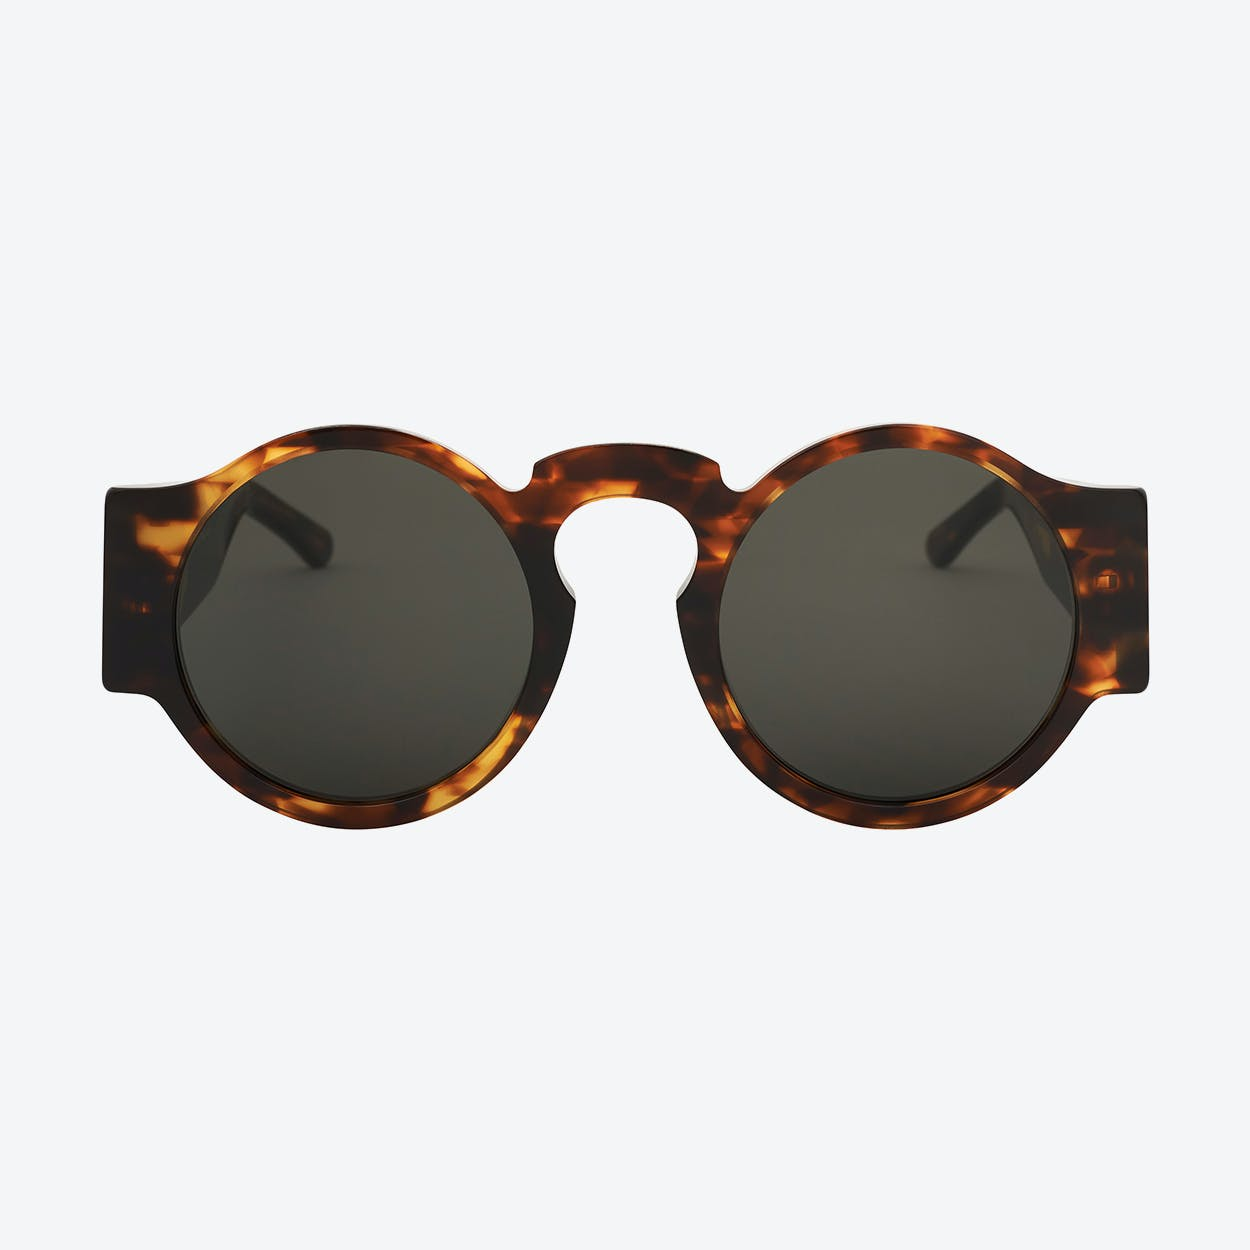 Didac Sunglasses in Tortoise